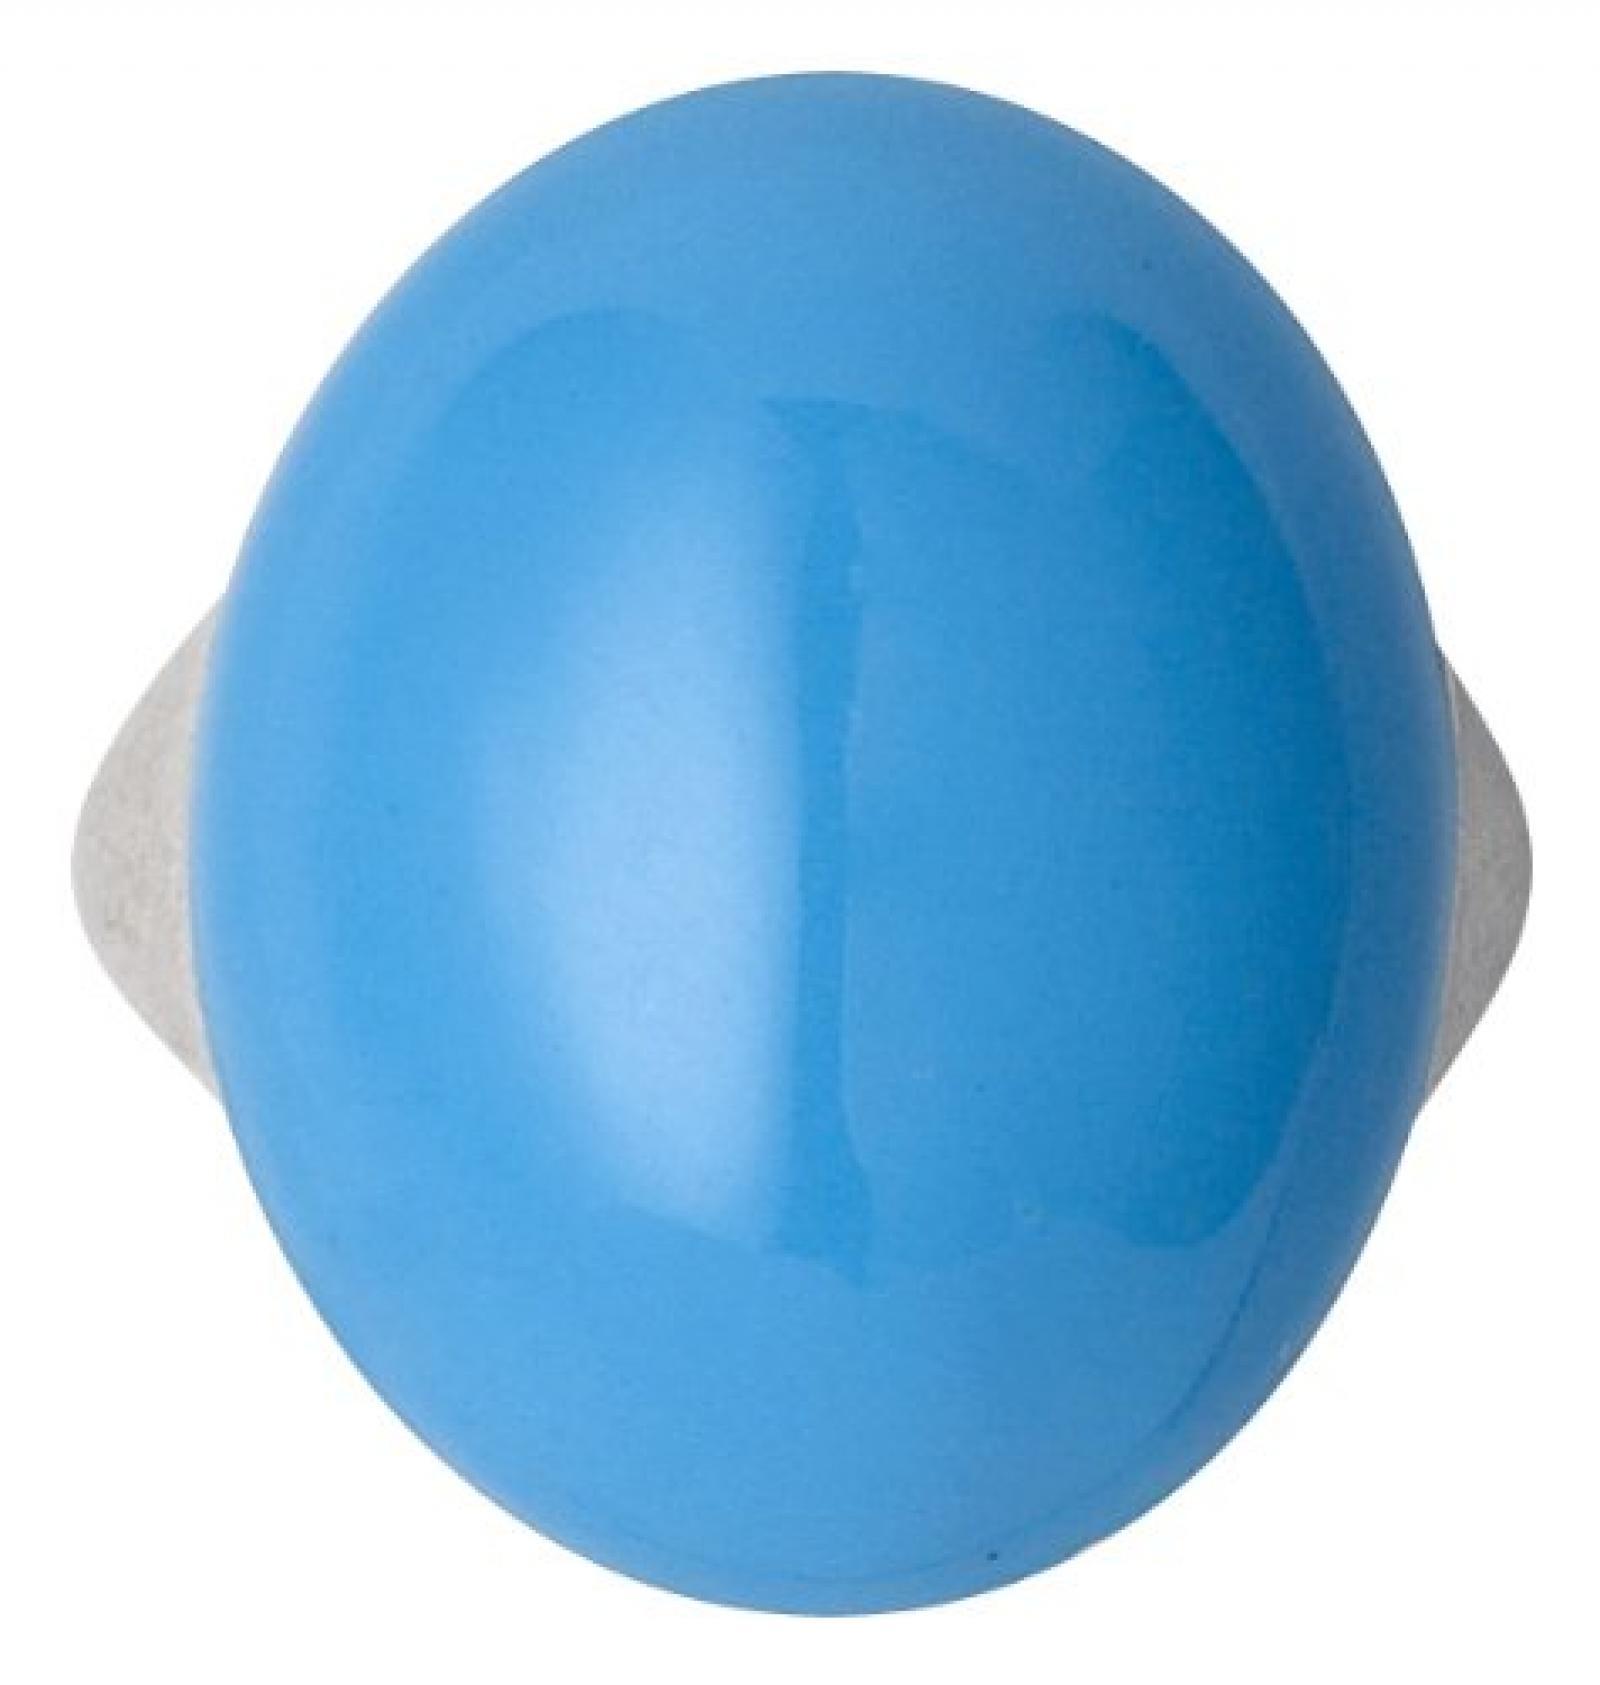 Pilgrim Jewelry Damen-Ring aus der Serie Energetic versilbert türkis 2.1 cm verstellbar Gr. 51-59 251316204